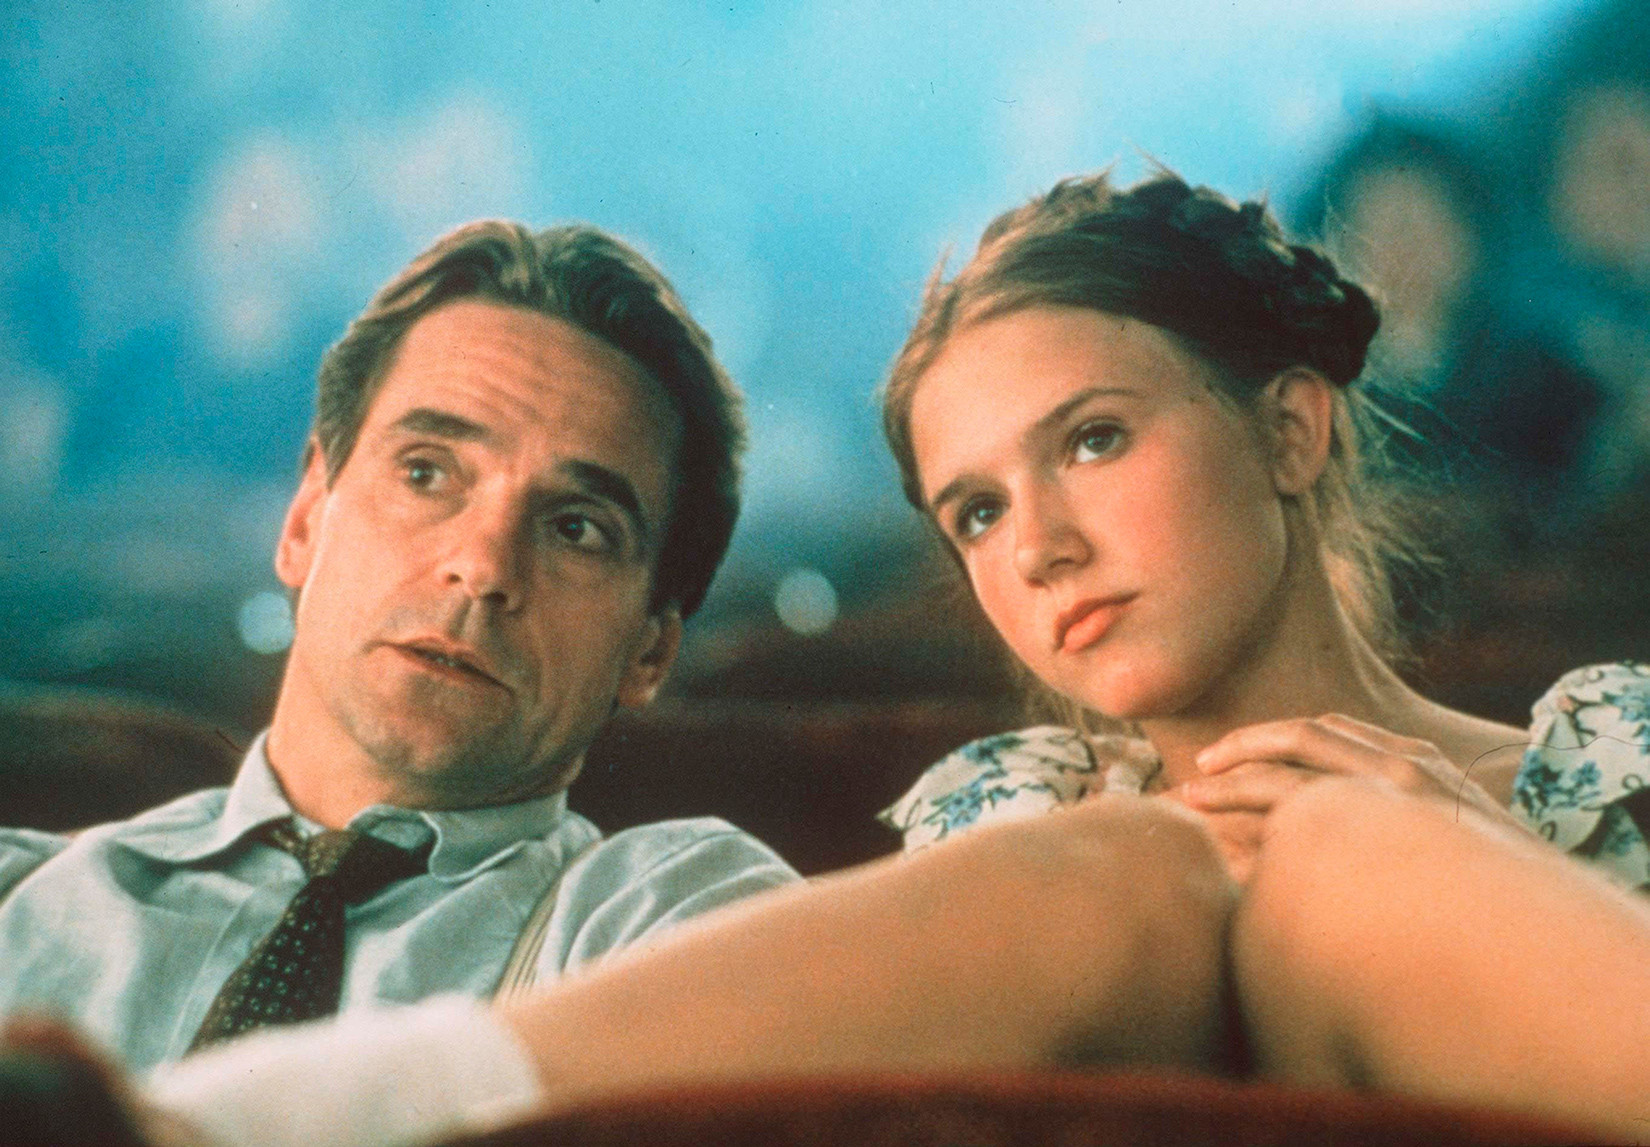 A scene from Adrian Lyne's Lolita (1997).